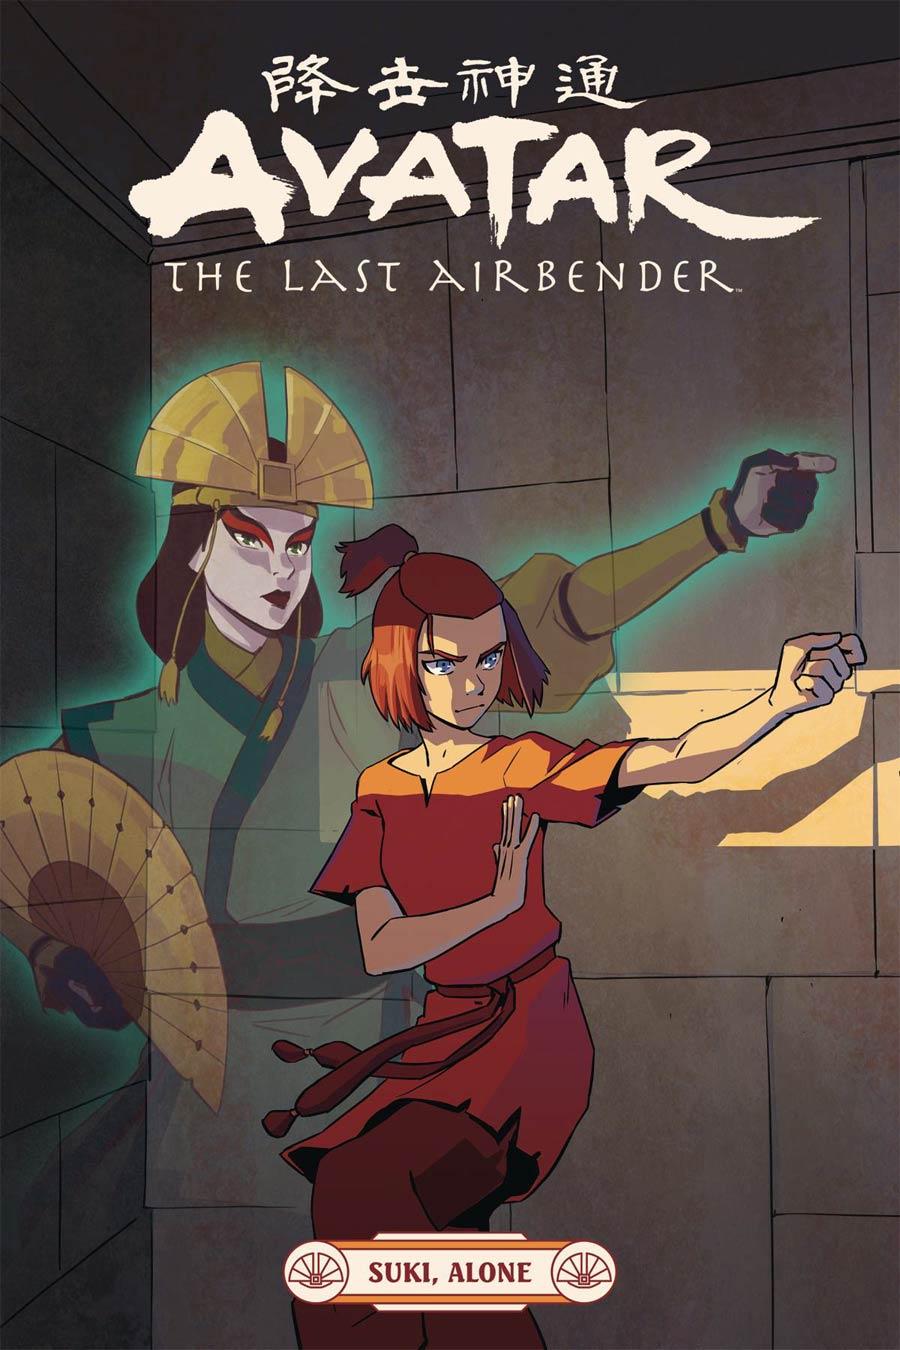 Avatar The Last Airbender Suki Alone TP